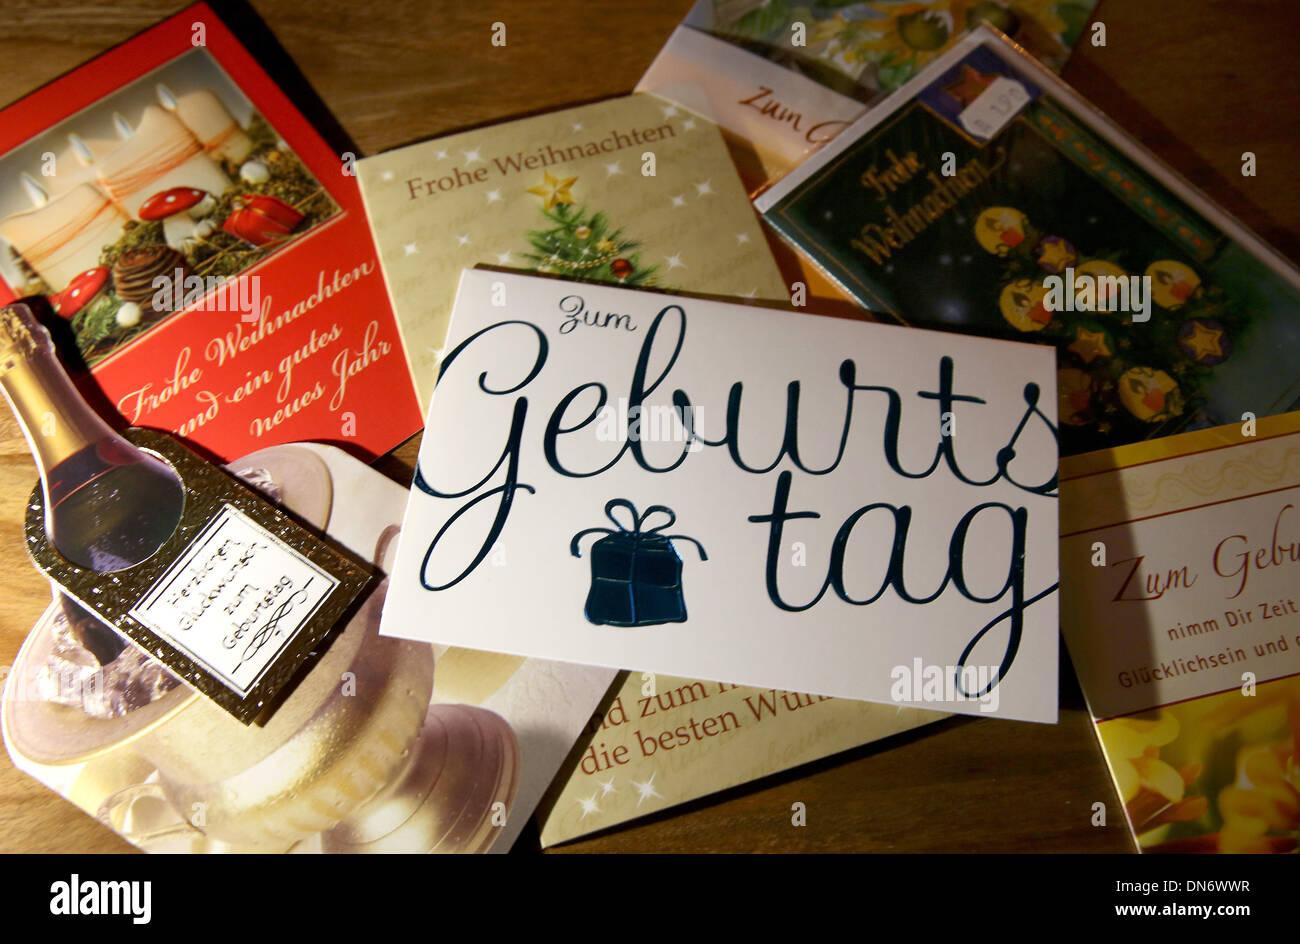 Hamburg Germany 19th Dec 2013 ILLUSTRATION